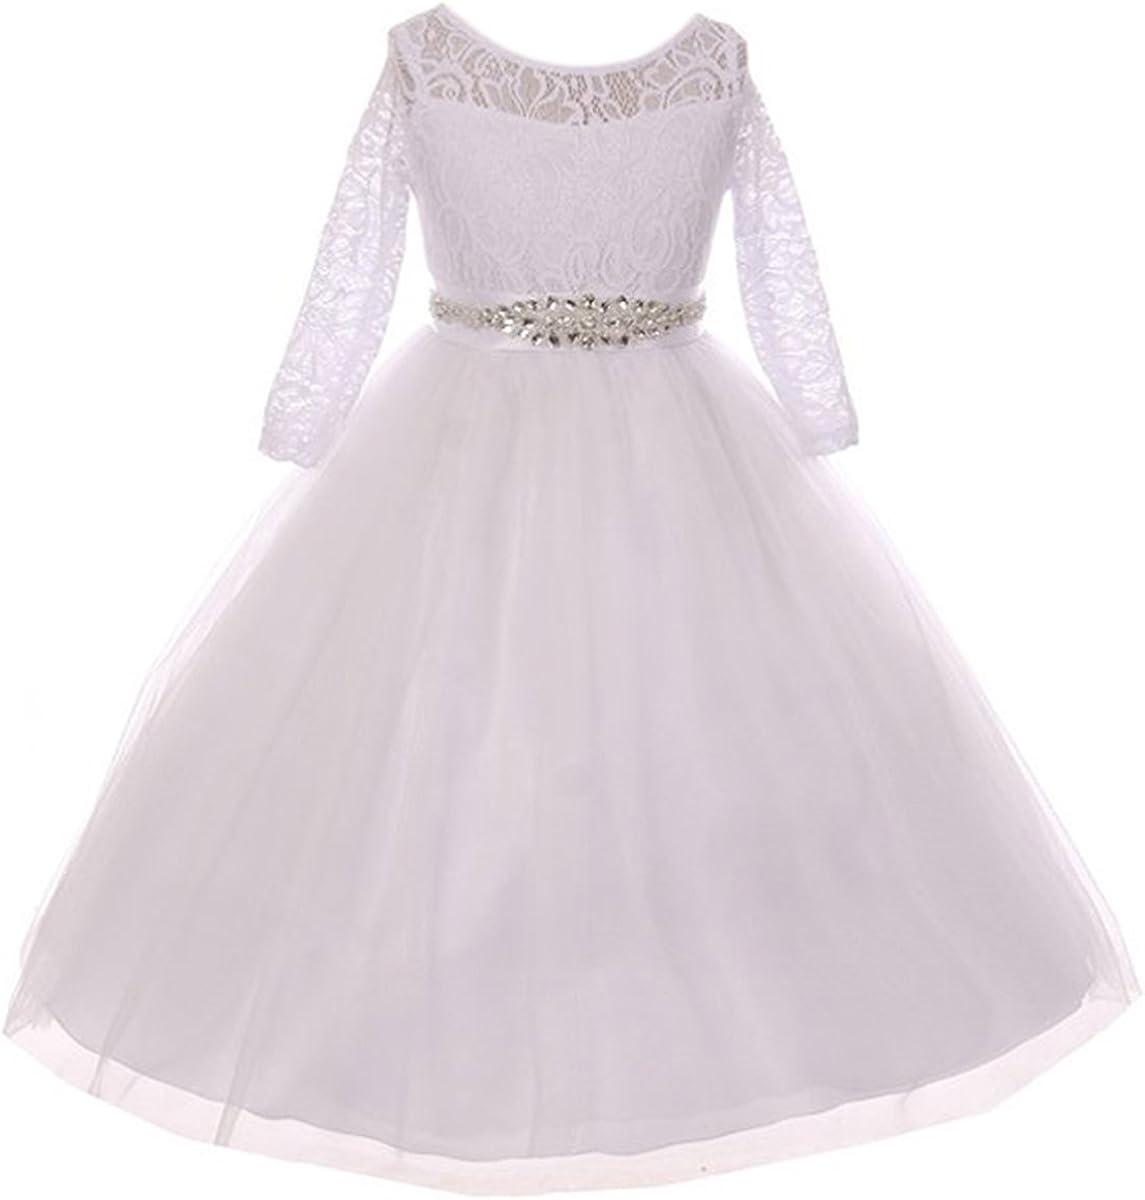 Girls Dress Lace Top Rhinestones Tulle Communion Party Flower Girl Dress 2-20